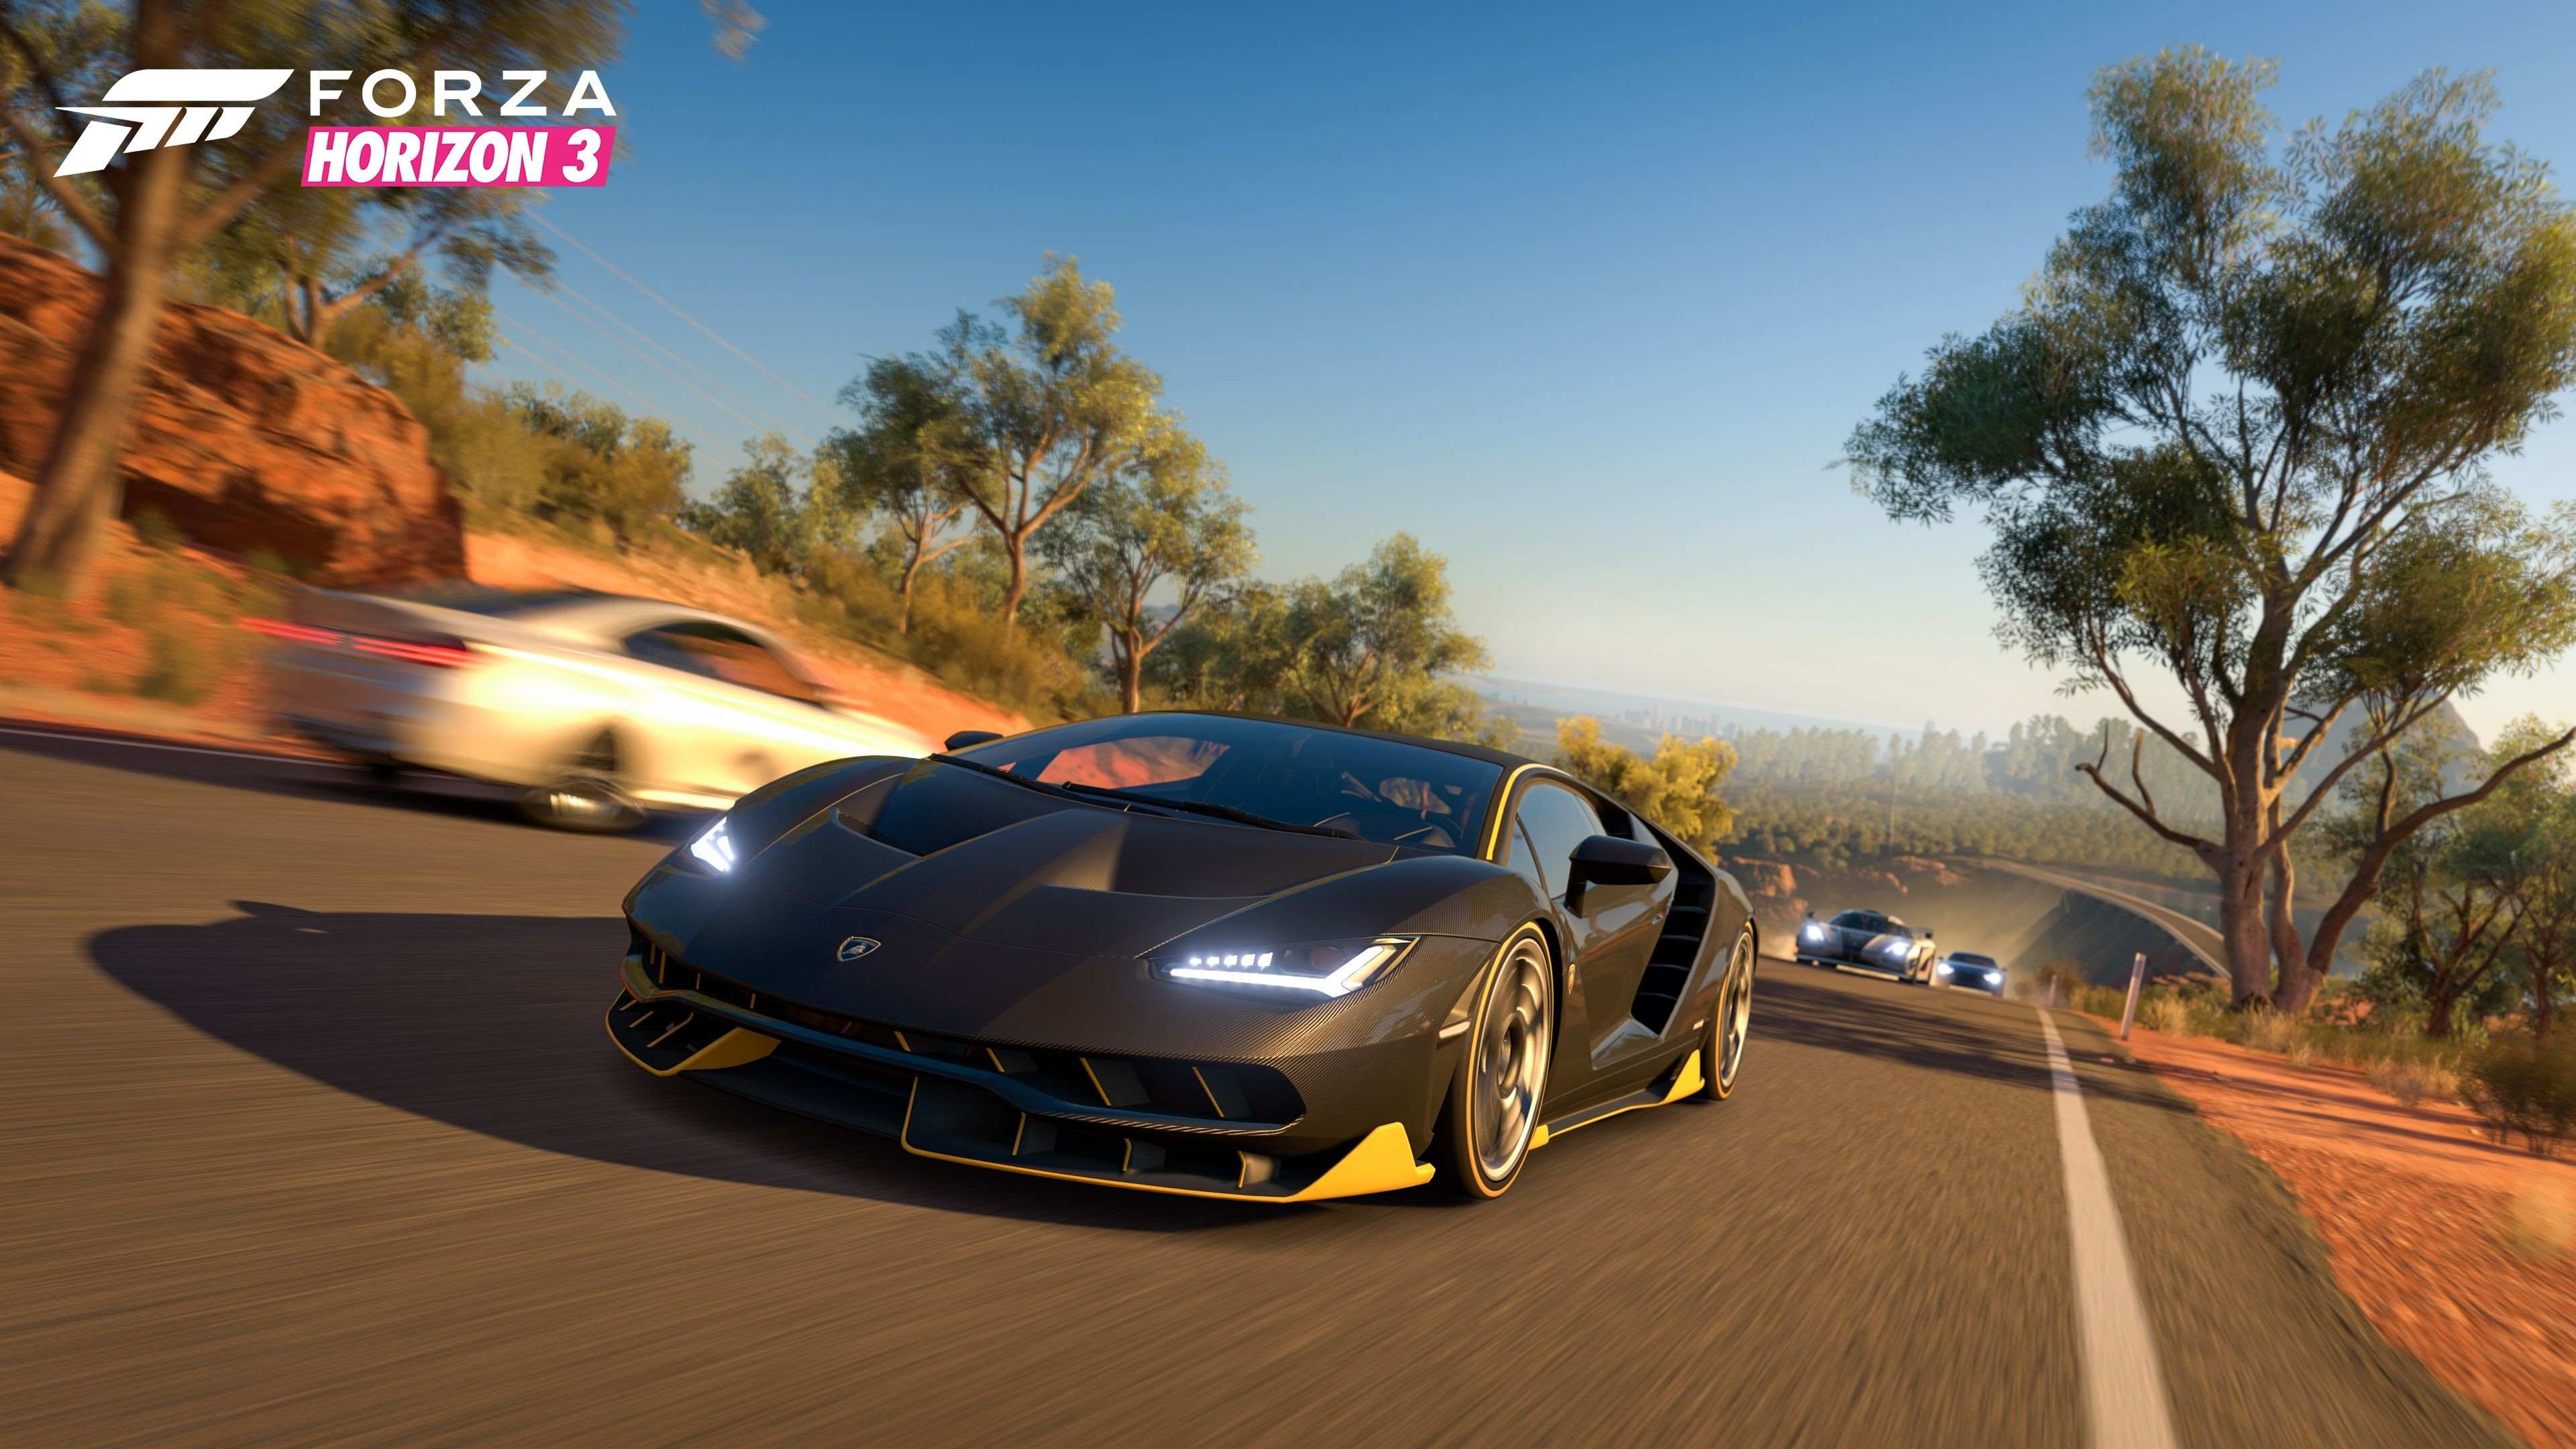 Forza Horizon 3 Wallpapers Wallpapertag